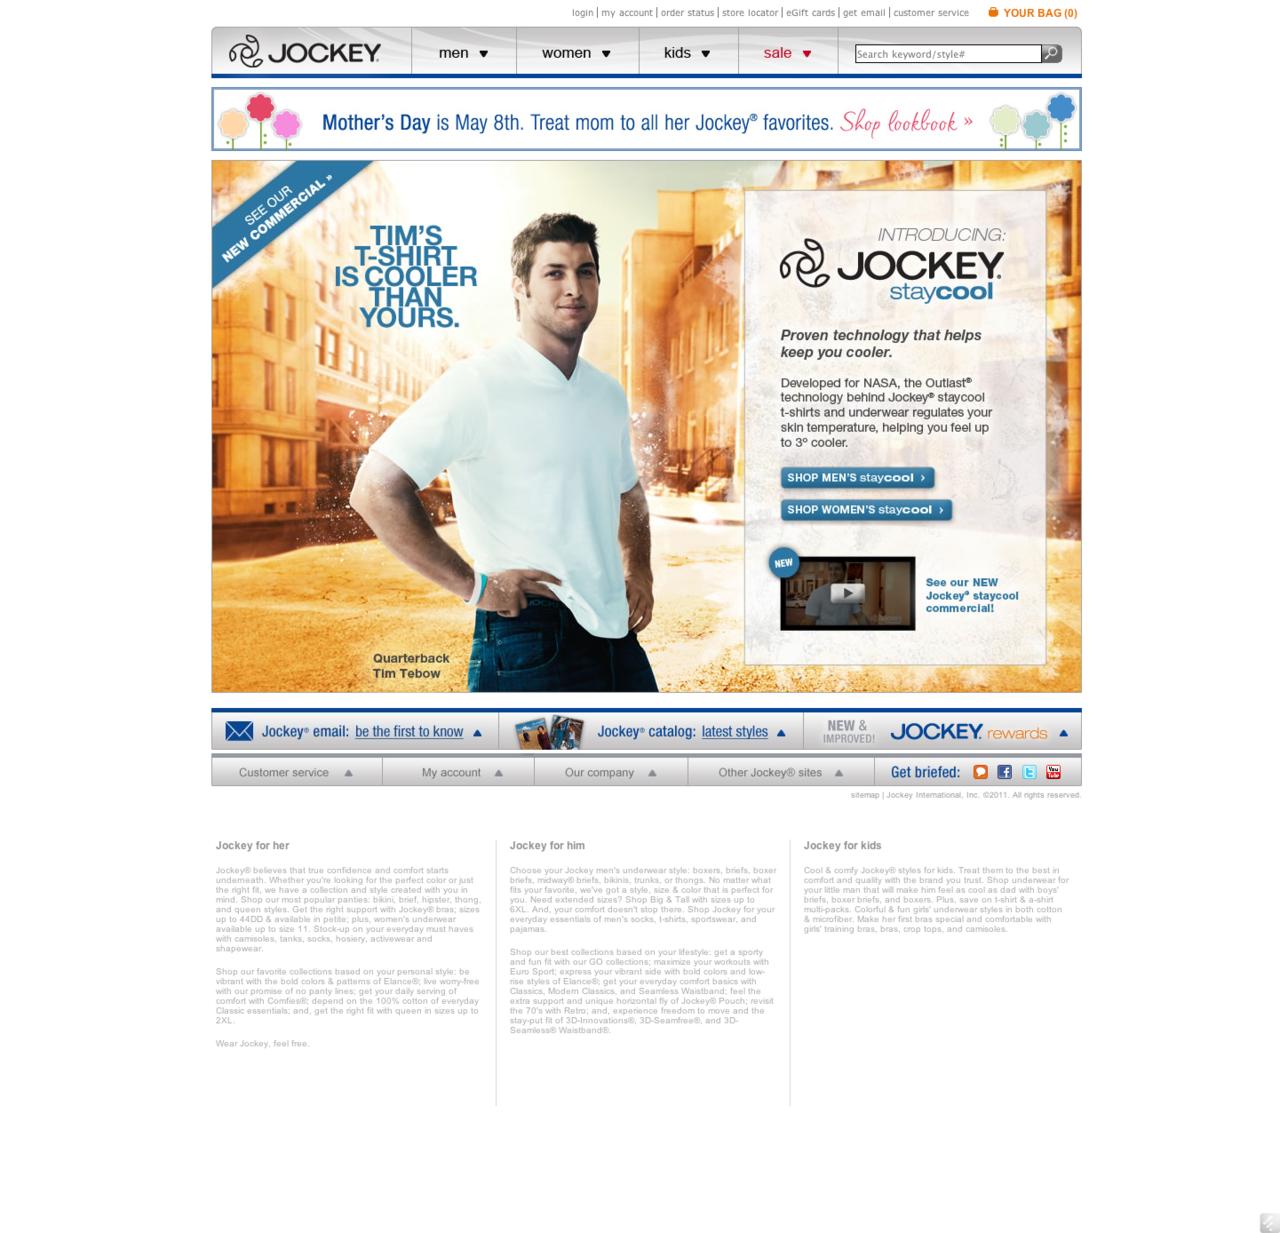 www.jockey.com